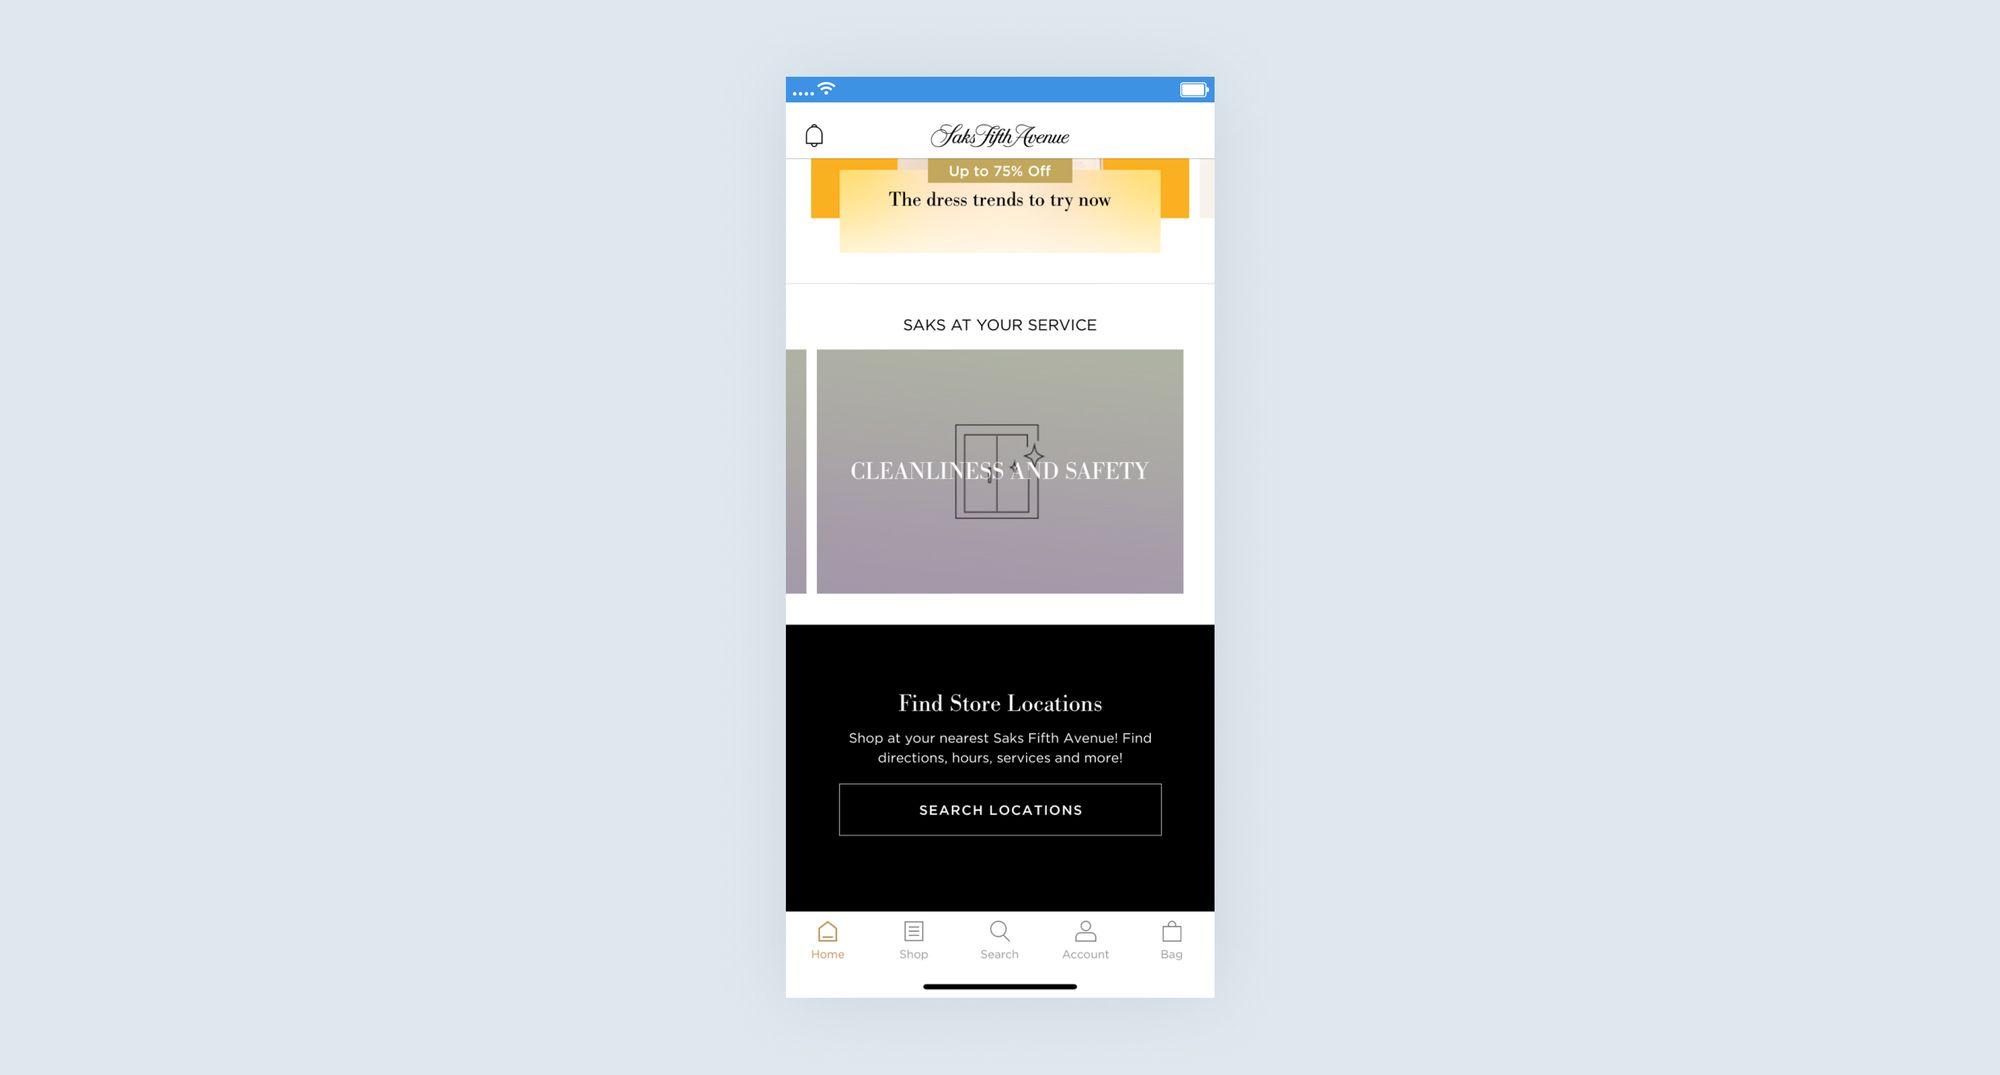 Saks Fifth Avenue mobile app